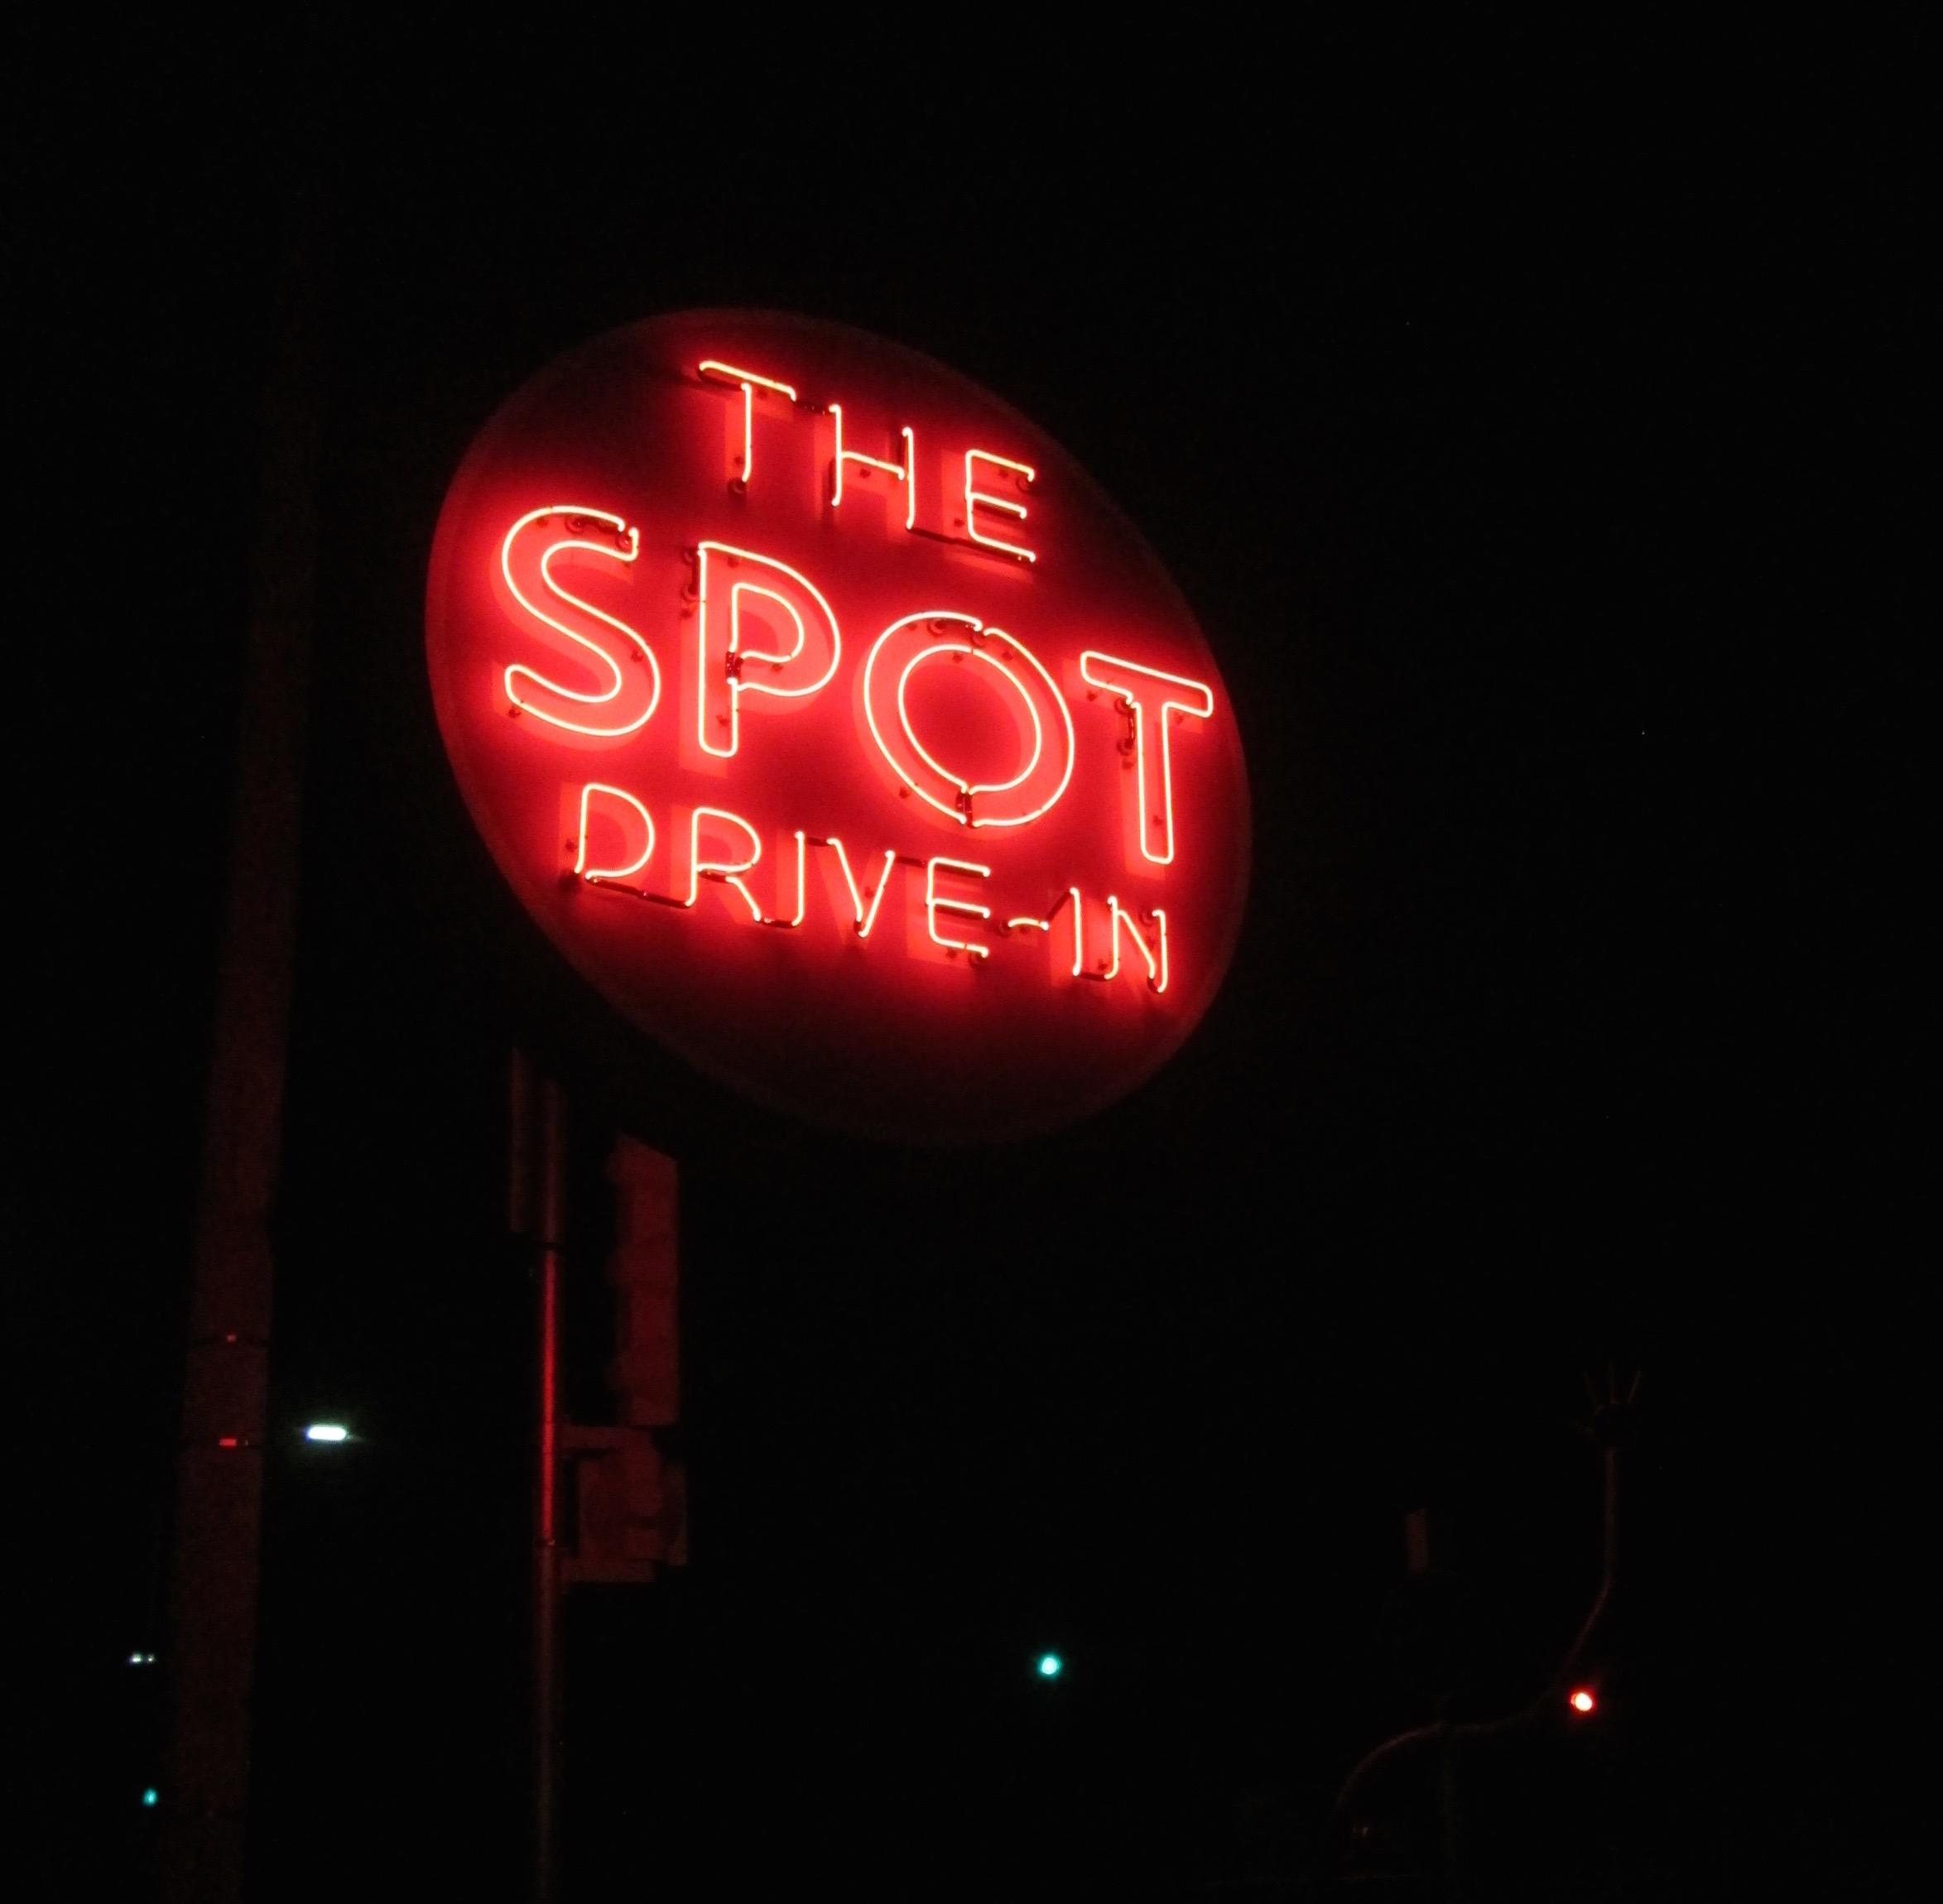 The Spot Drive-In - 2117 75th Street, Kenosha, Wisconsin U.S.A. - August 9, 2017